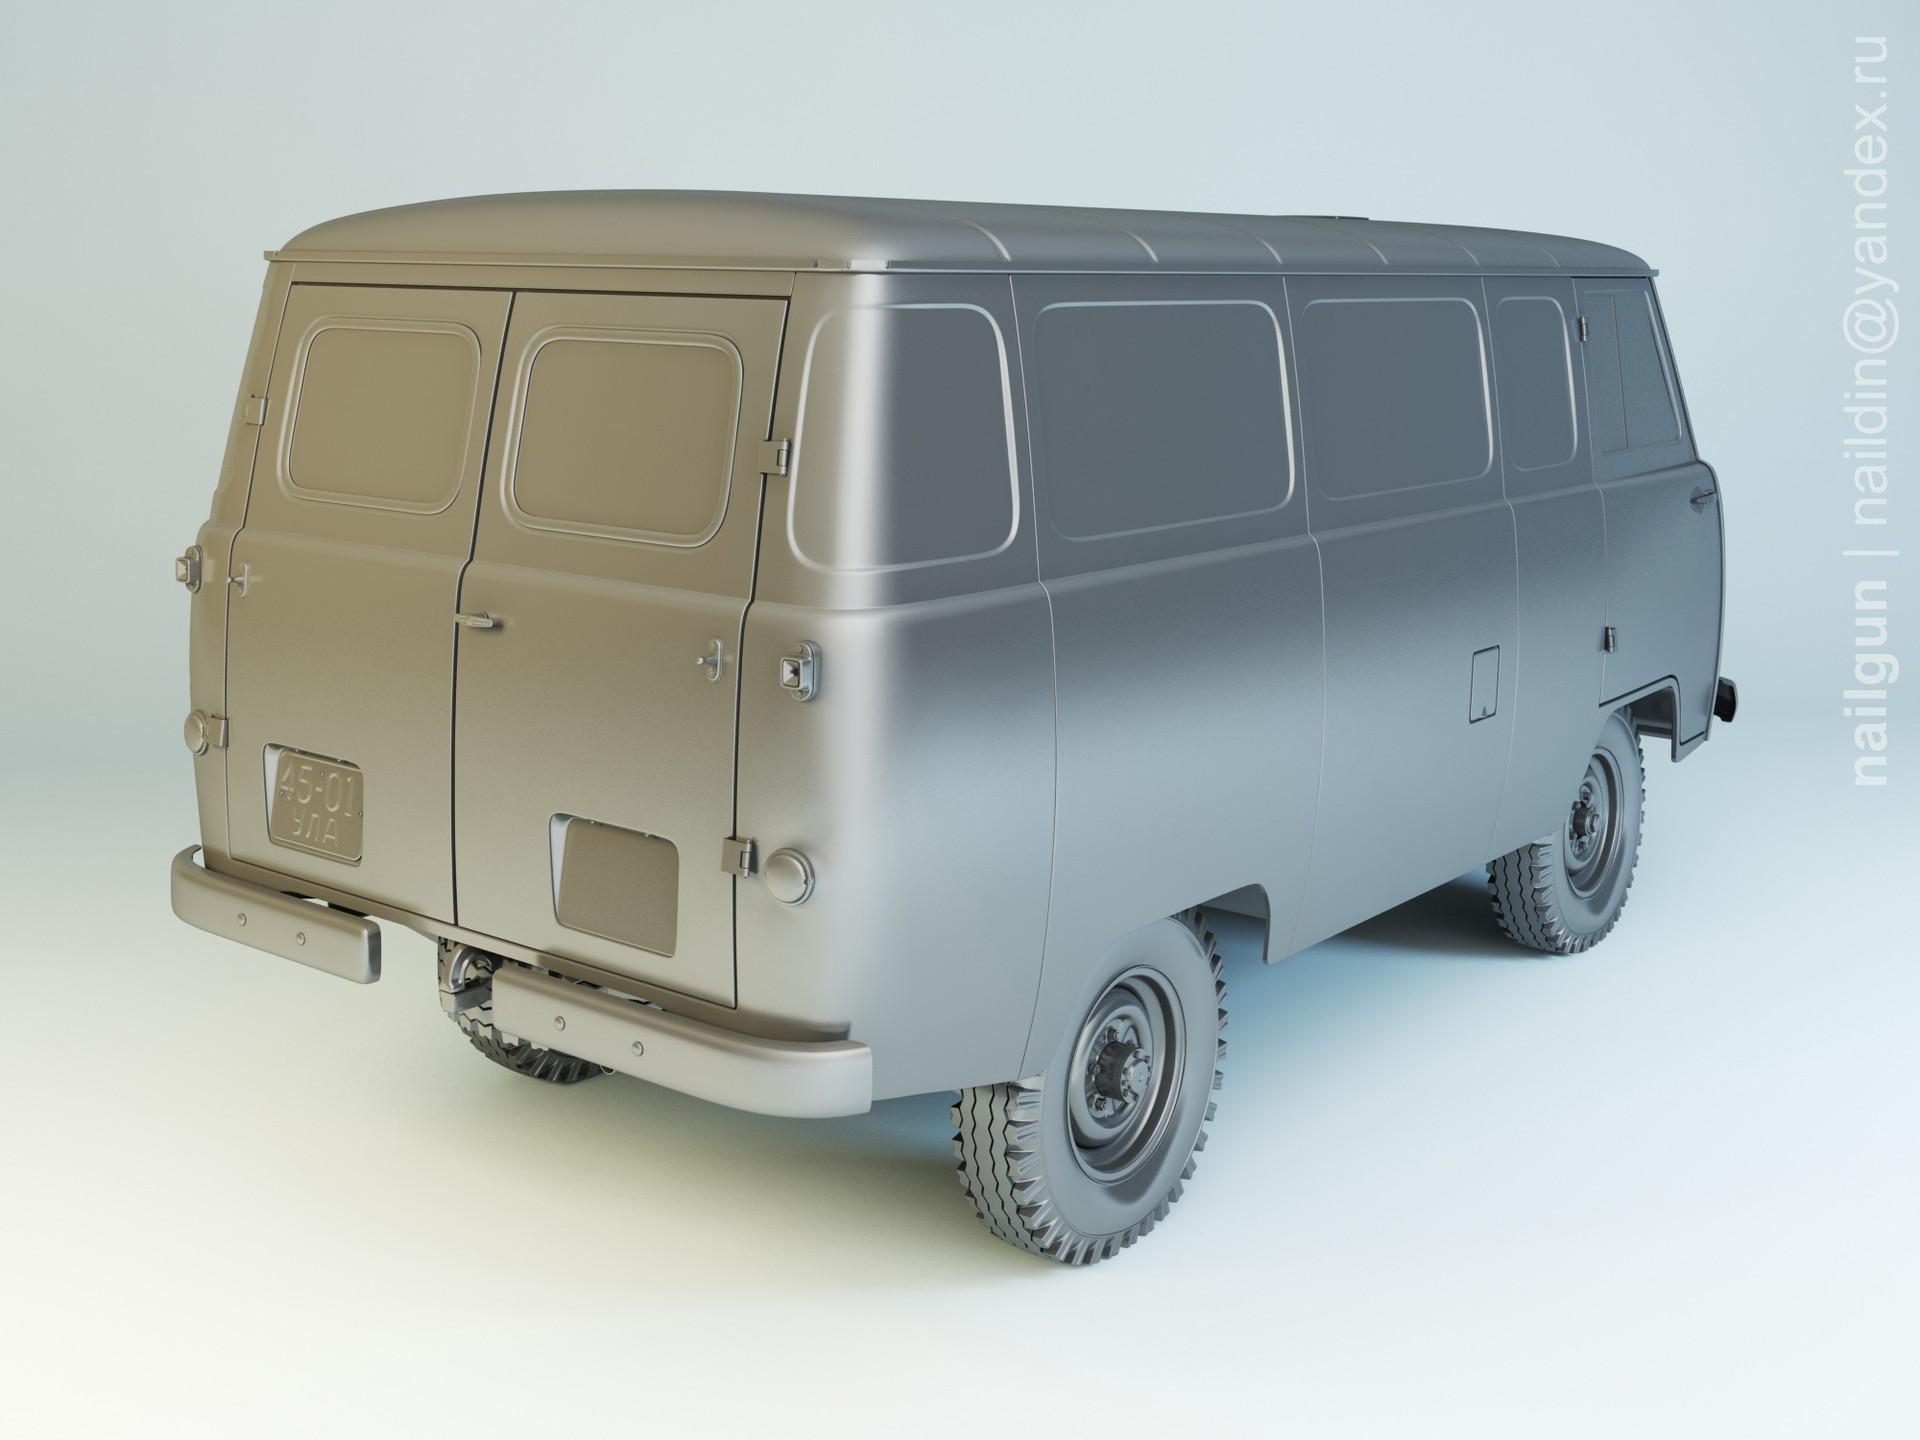 Nail khusnutdinov als 191 001 uaz 450 modelling 1